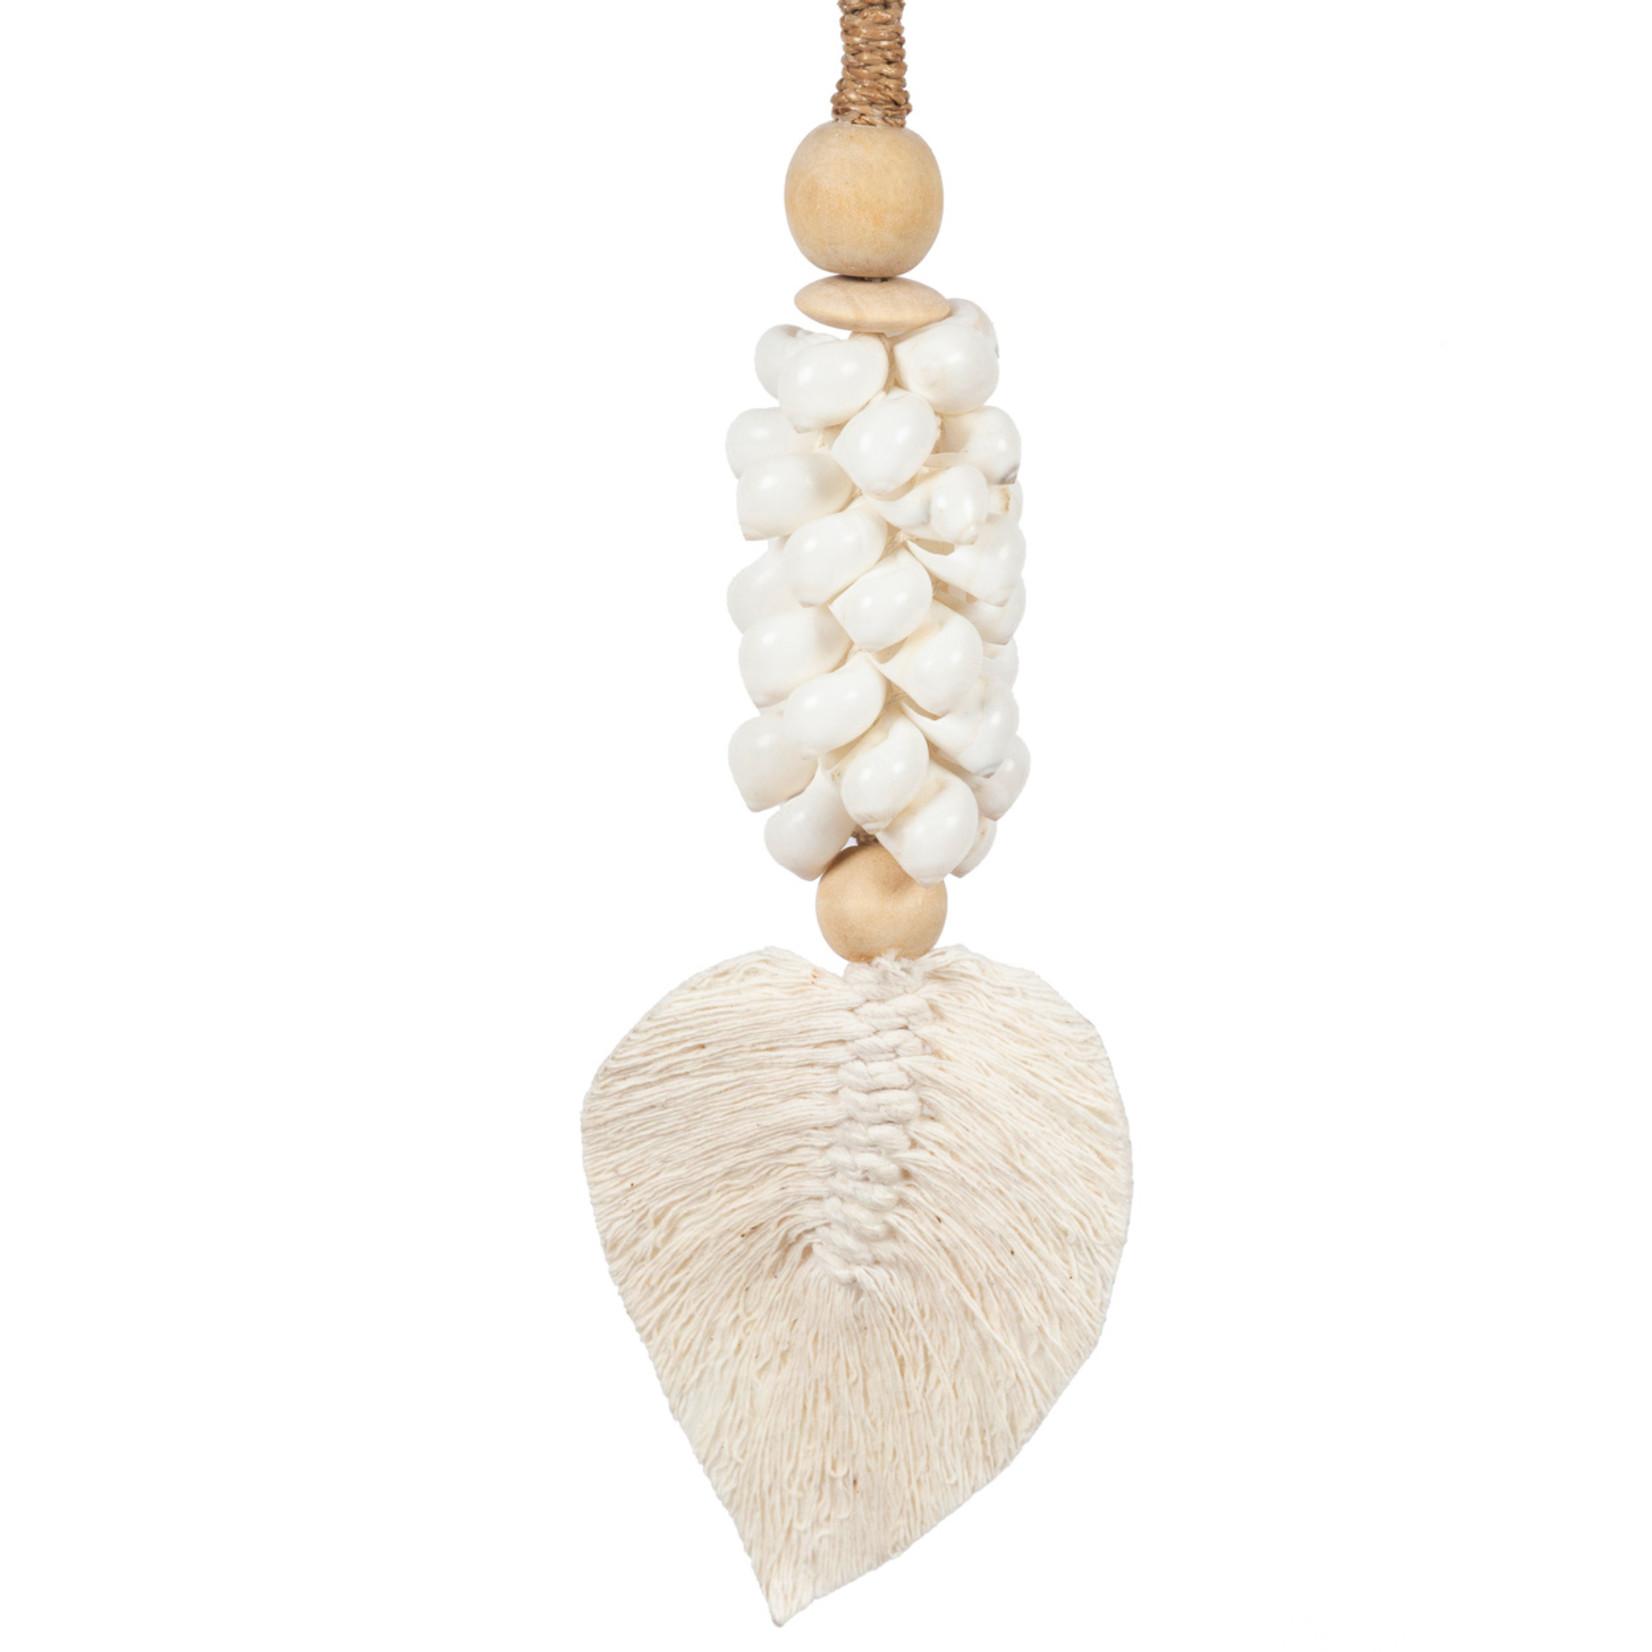 Bazar Bizar De Leaf & Shell Hangdecoratie - Wit